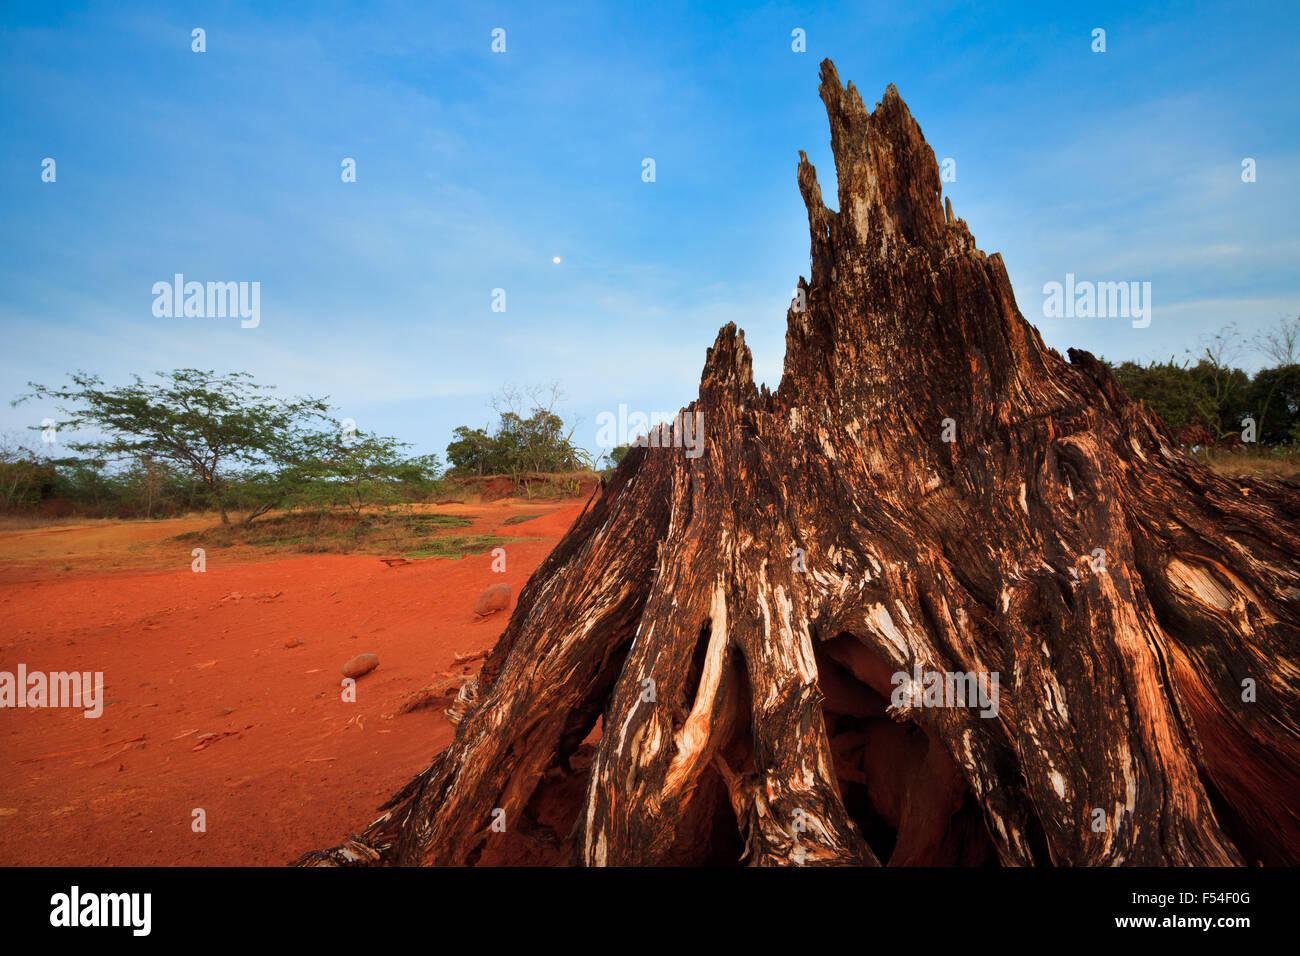 Dry tree root at twilight in Sarigua national park (desert), Herrera province, Republic of Panama. Stock Photo